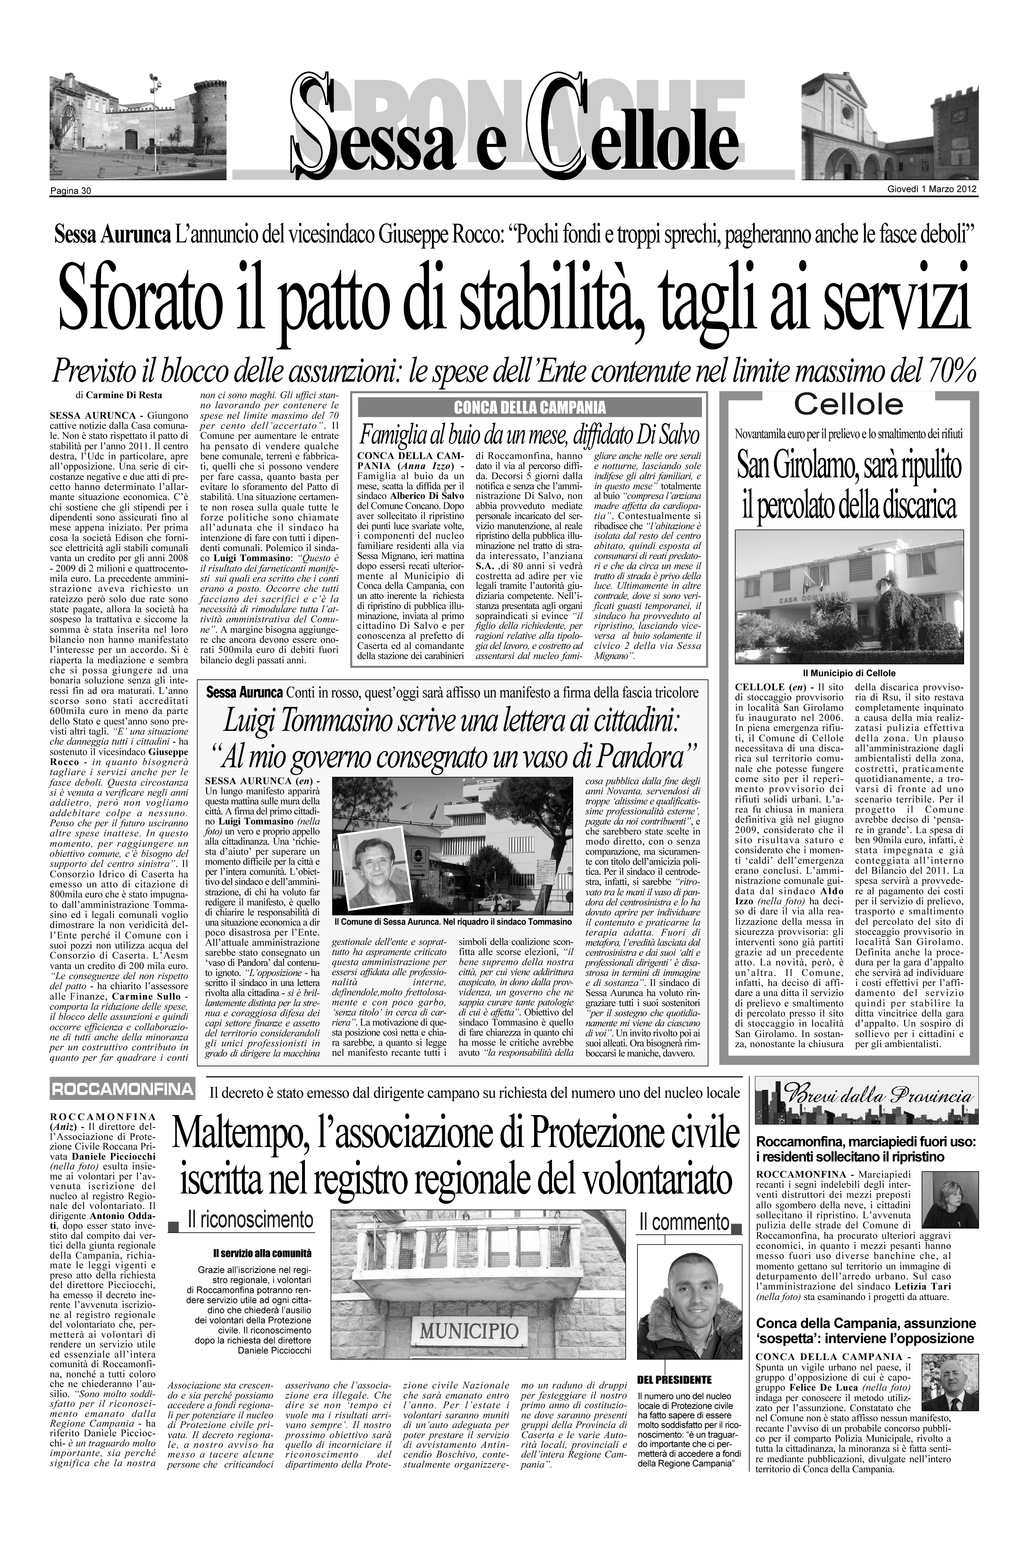 Smaltimento Rifiuti Sessa Aurunca calaméo - rassegna stampa marzo 2012